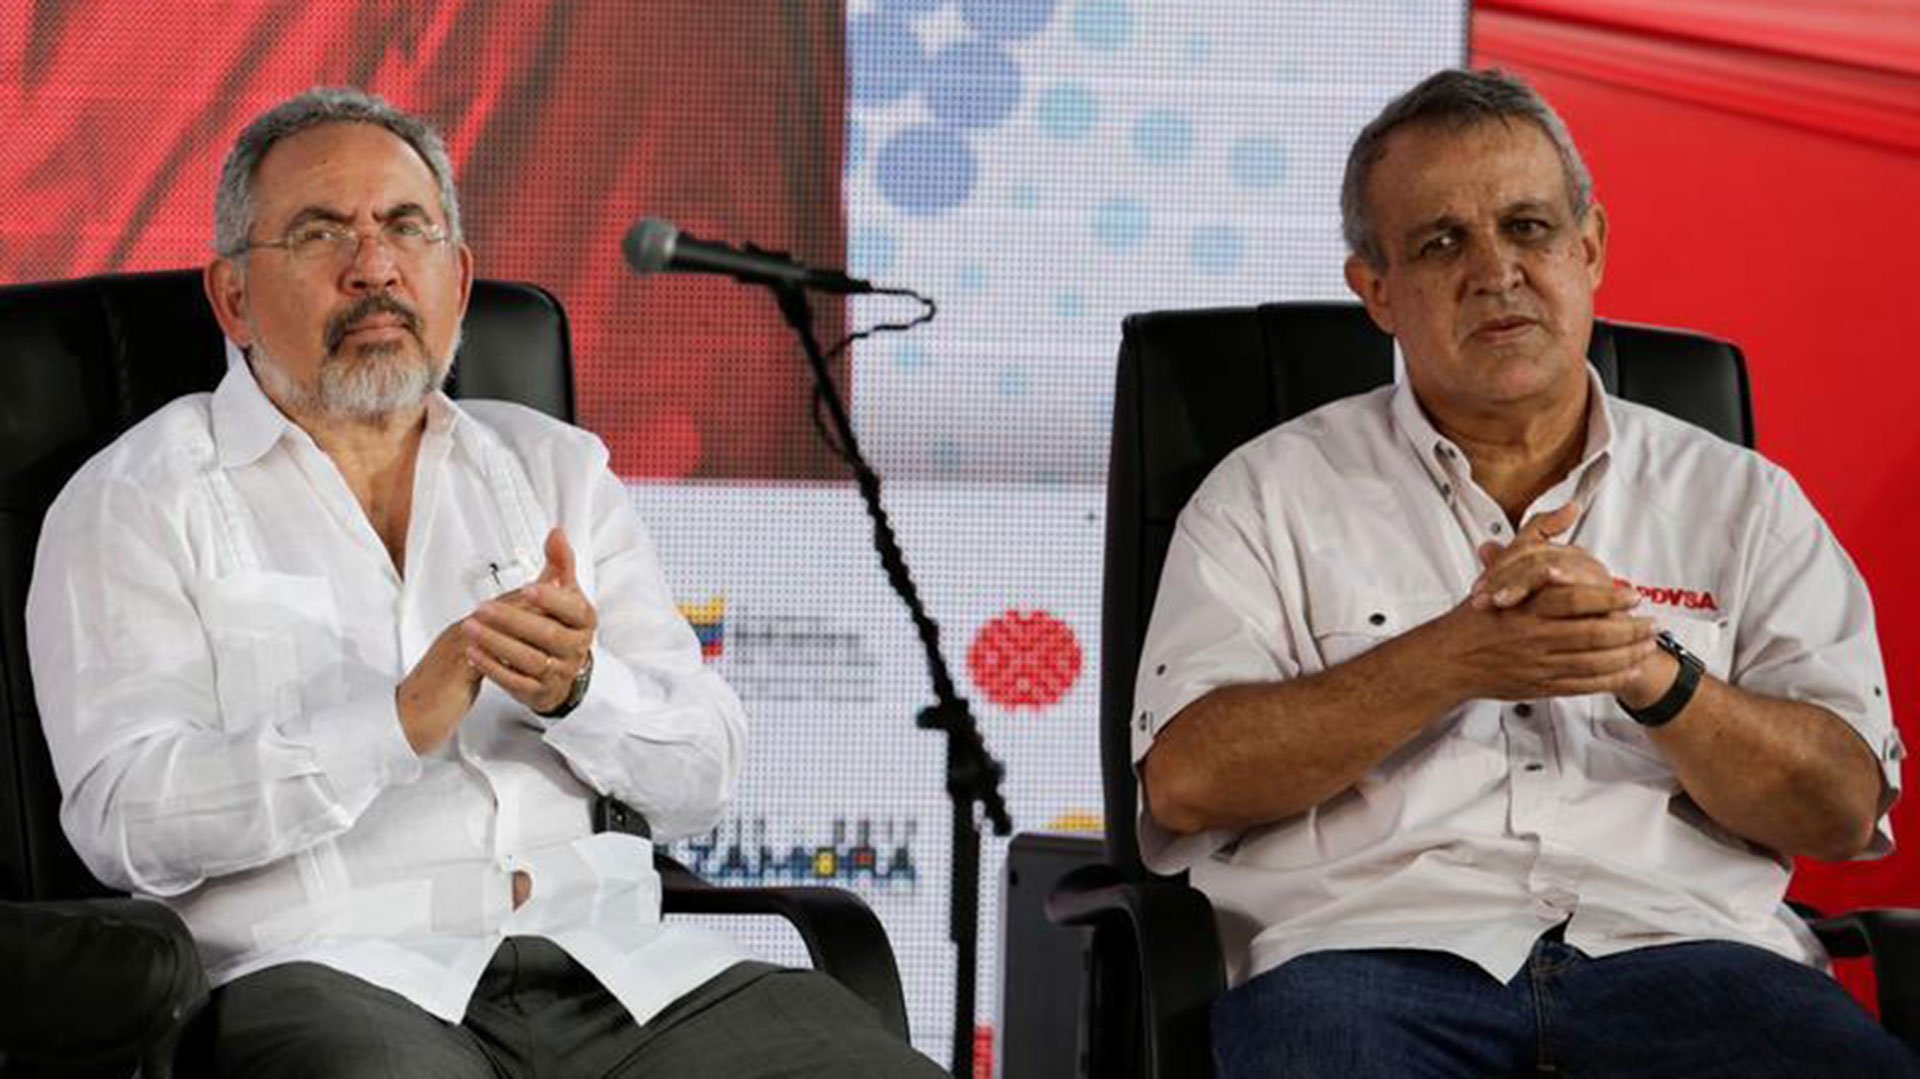 Nelson Martínez y Eulogio Pino (Reuters)